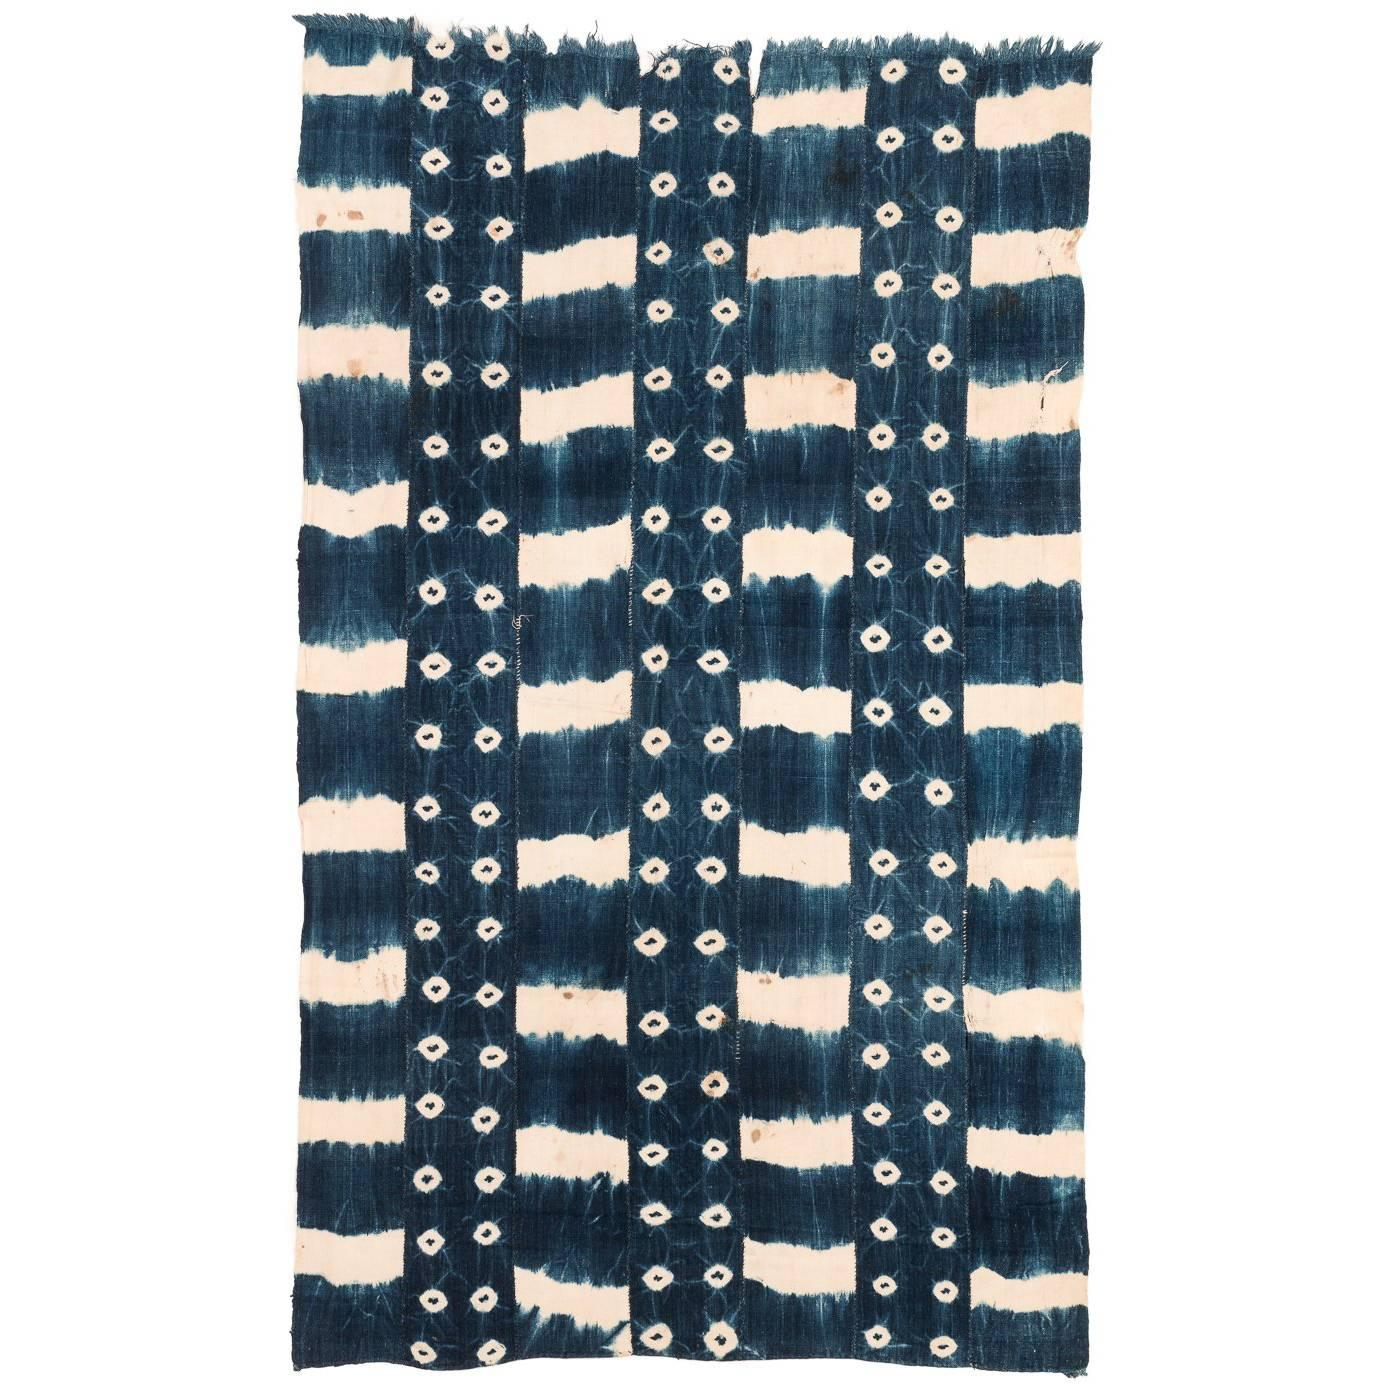 African Indigo Dyed Textile